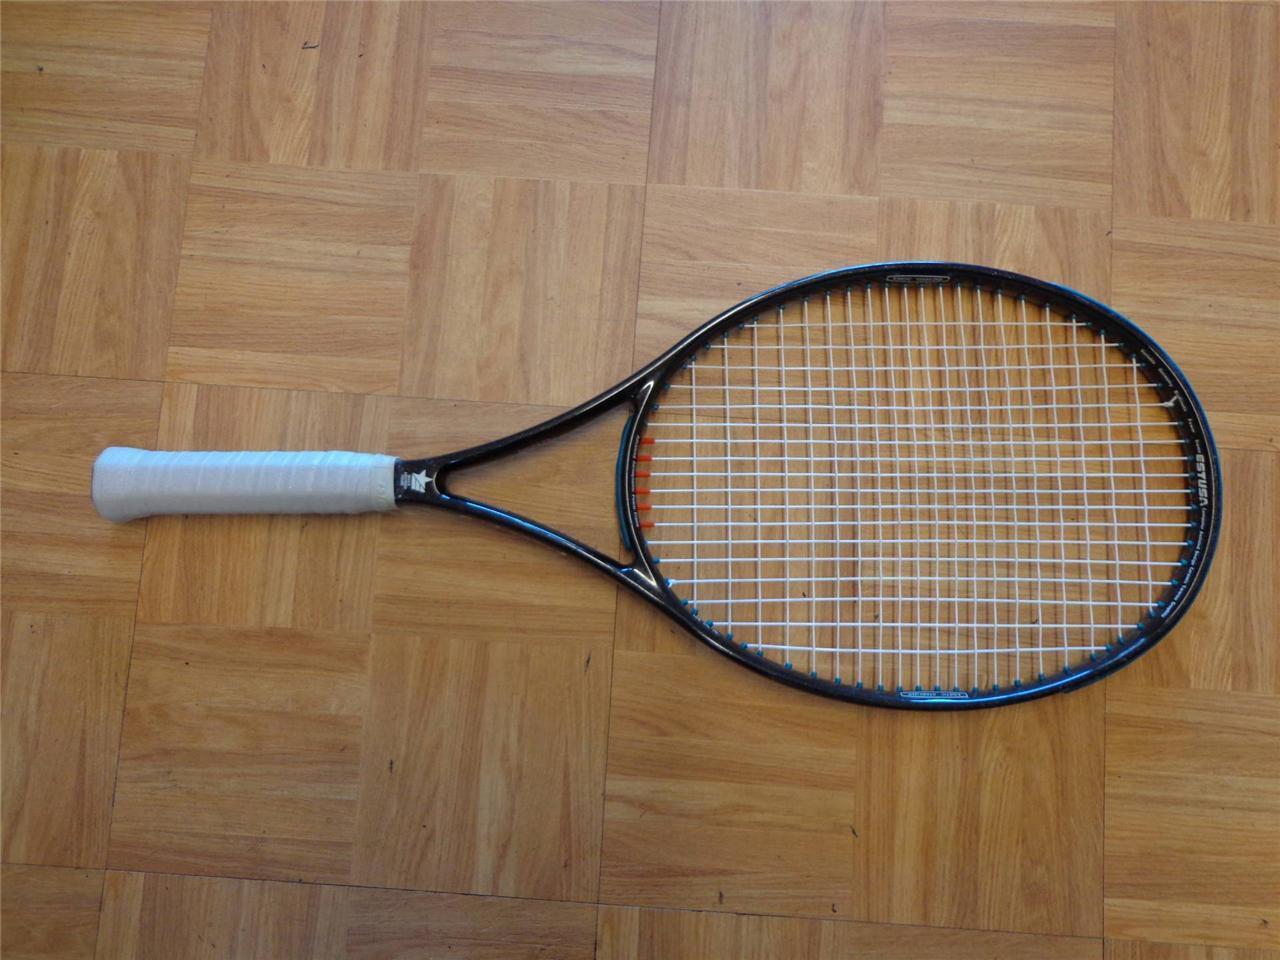 Estusa Pro Legend supra 4 4 4 5/8 Grip Tenis Raqueta 3d621e